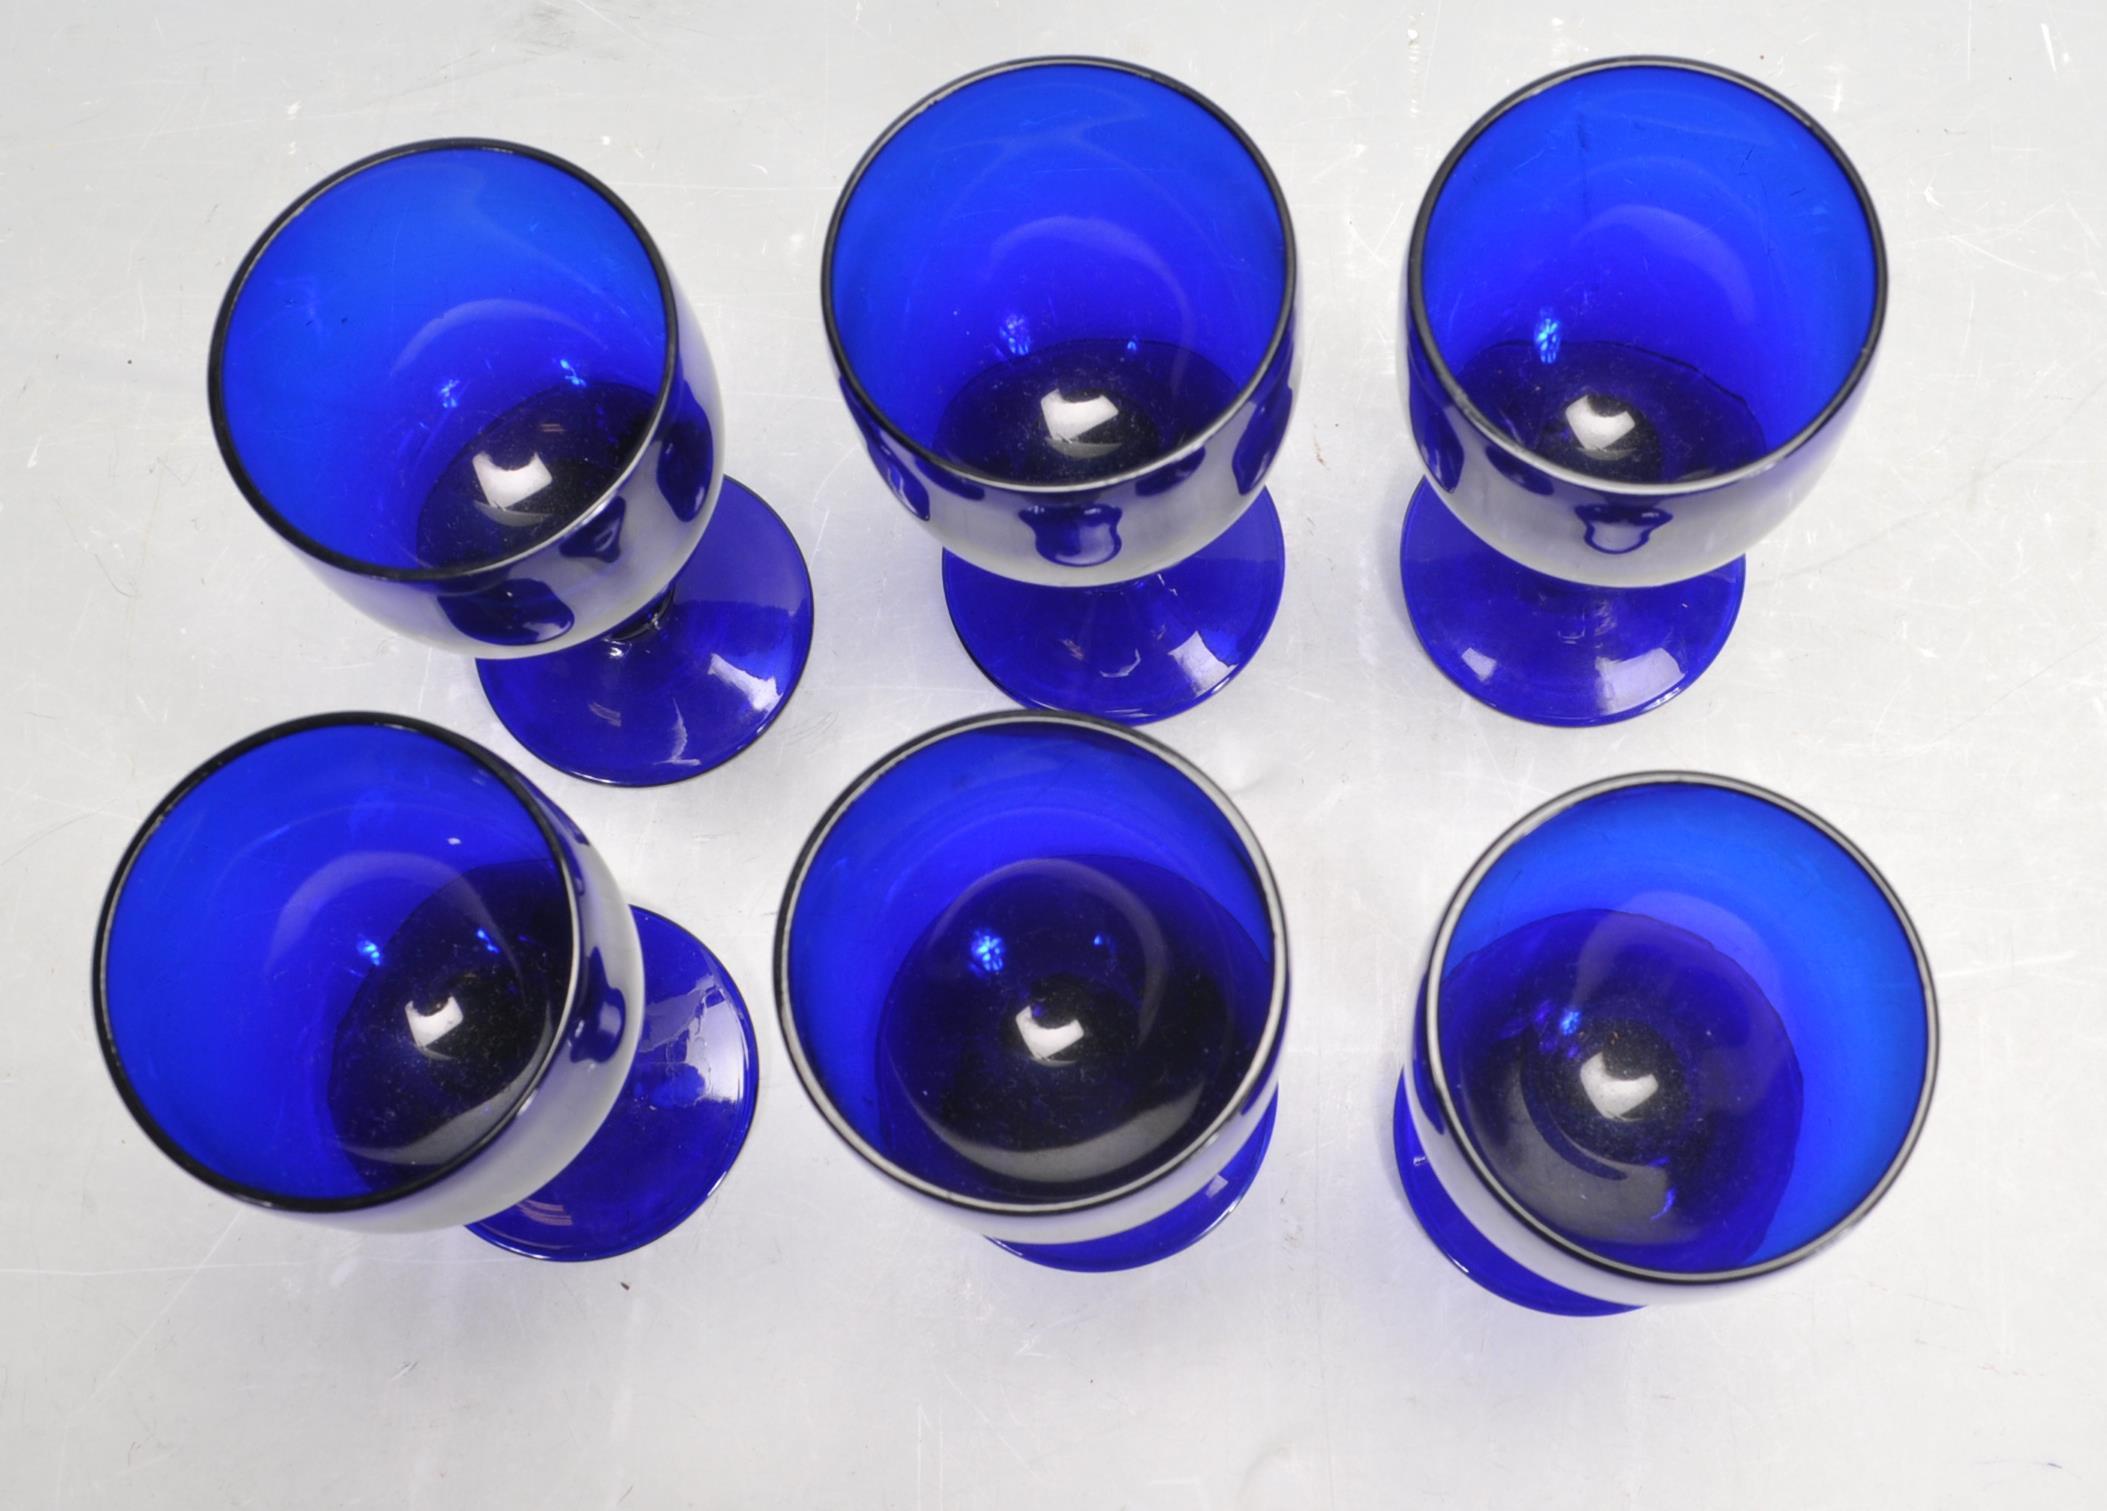 BRISTOL BLUE GLASS ORNAMENTS - Image 6 of 34